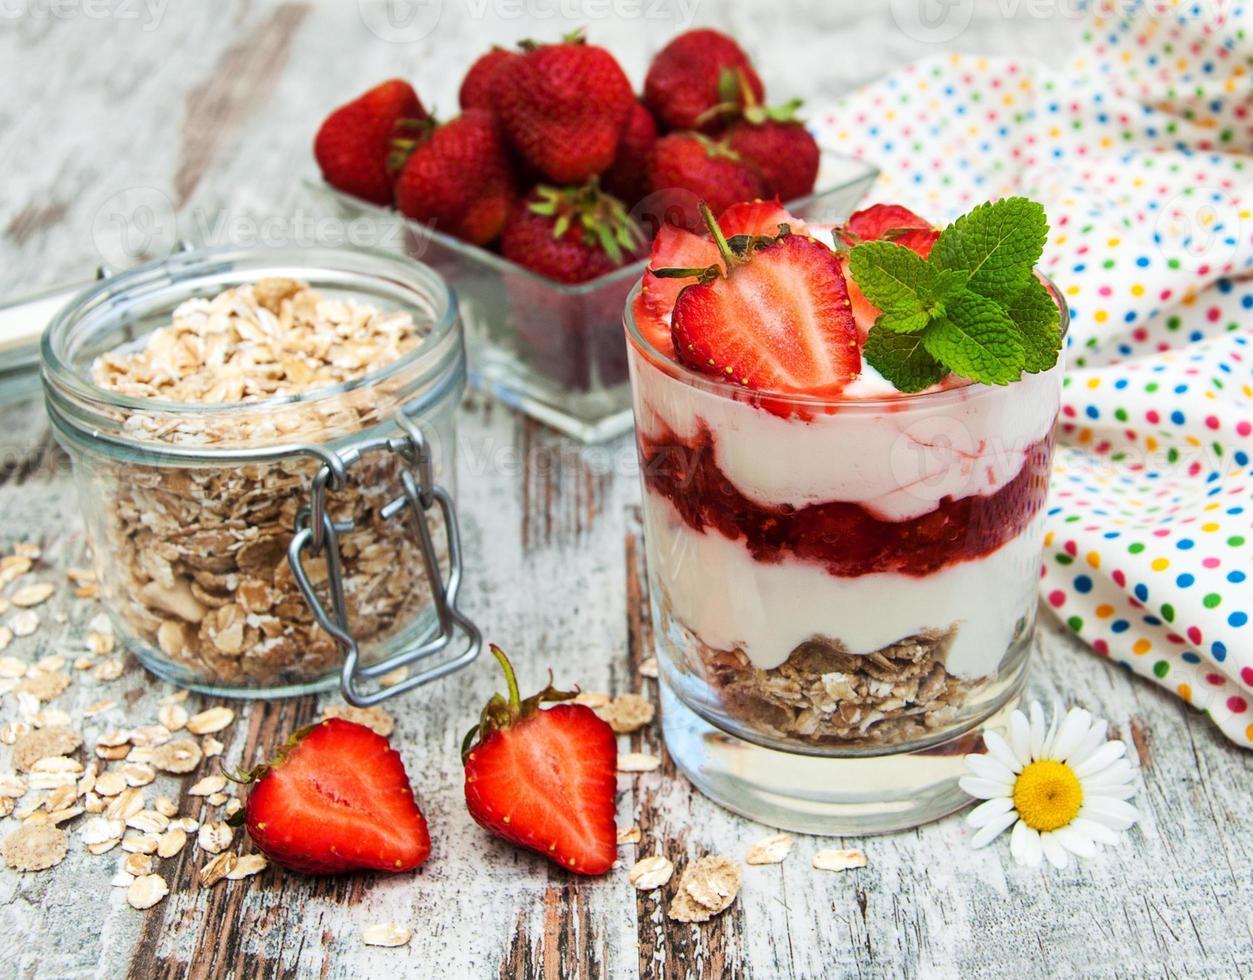 yogurt alla fragola con muesli foto